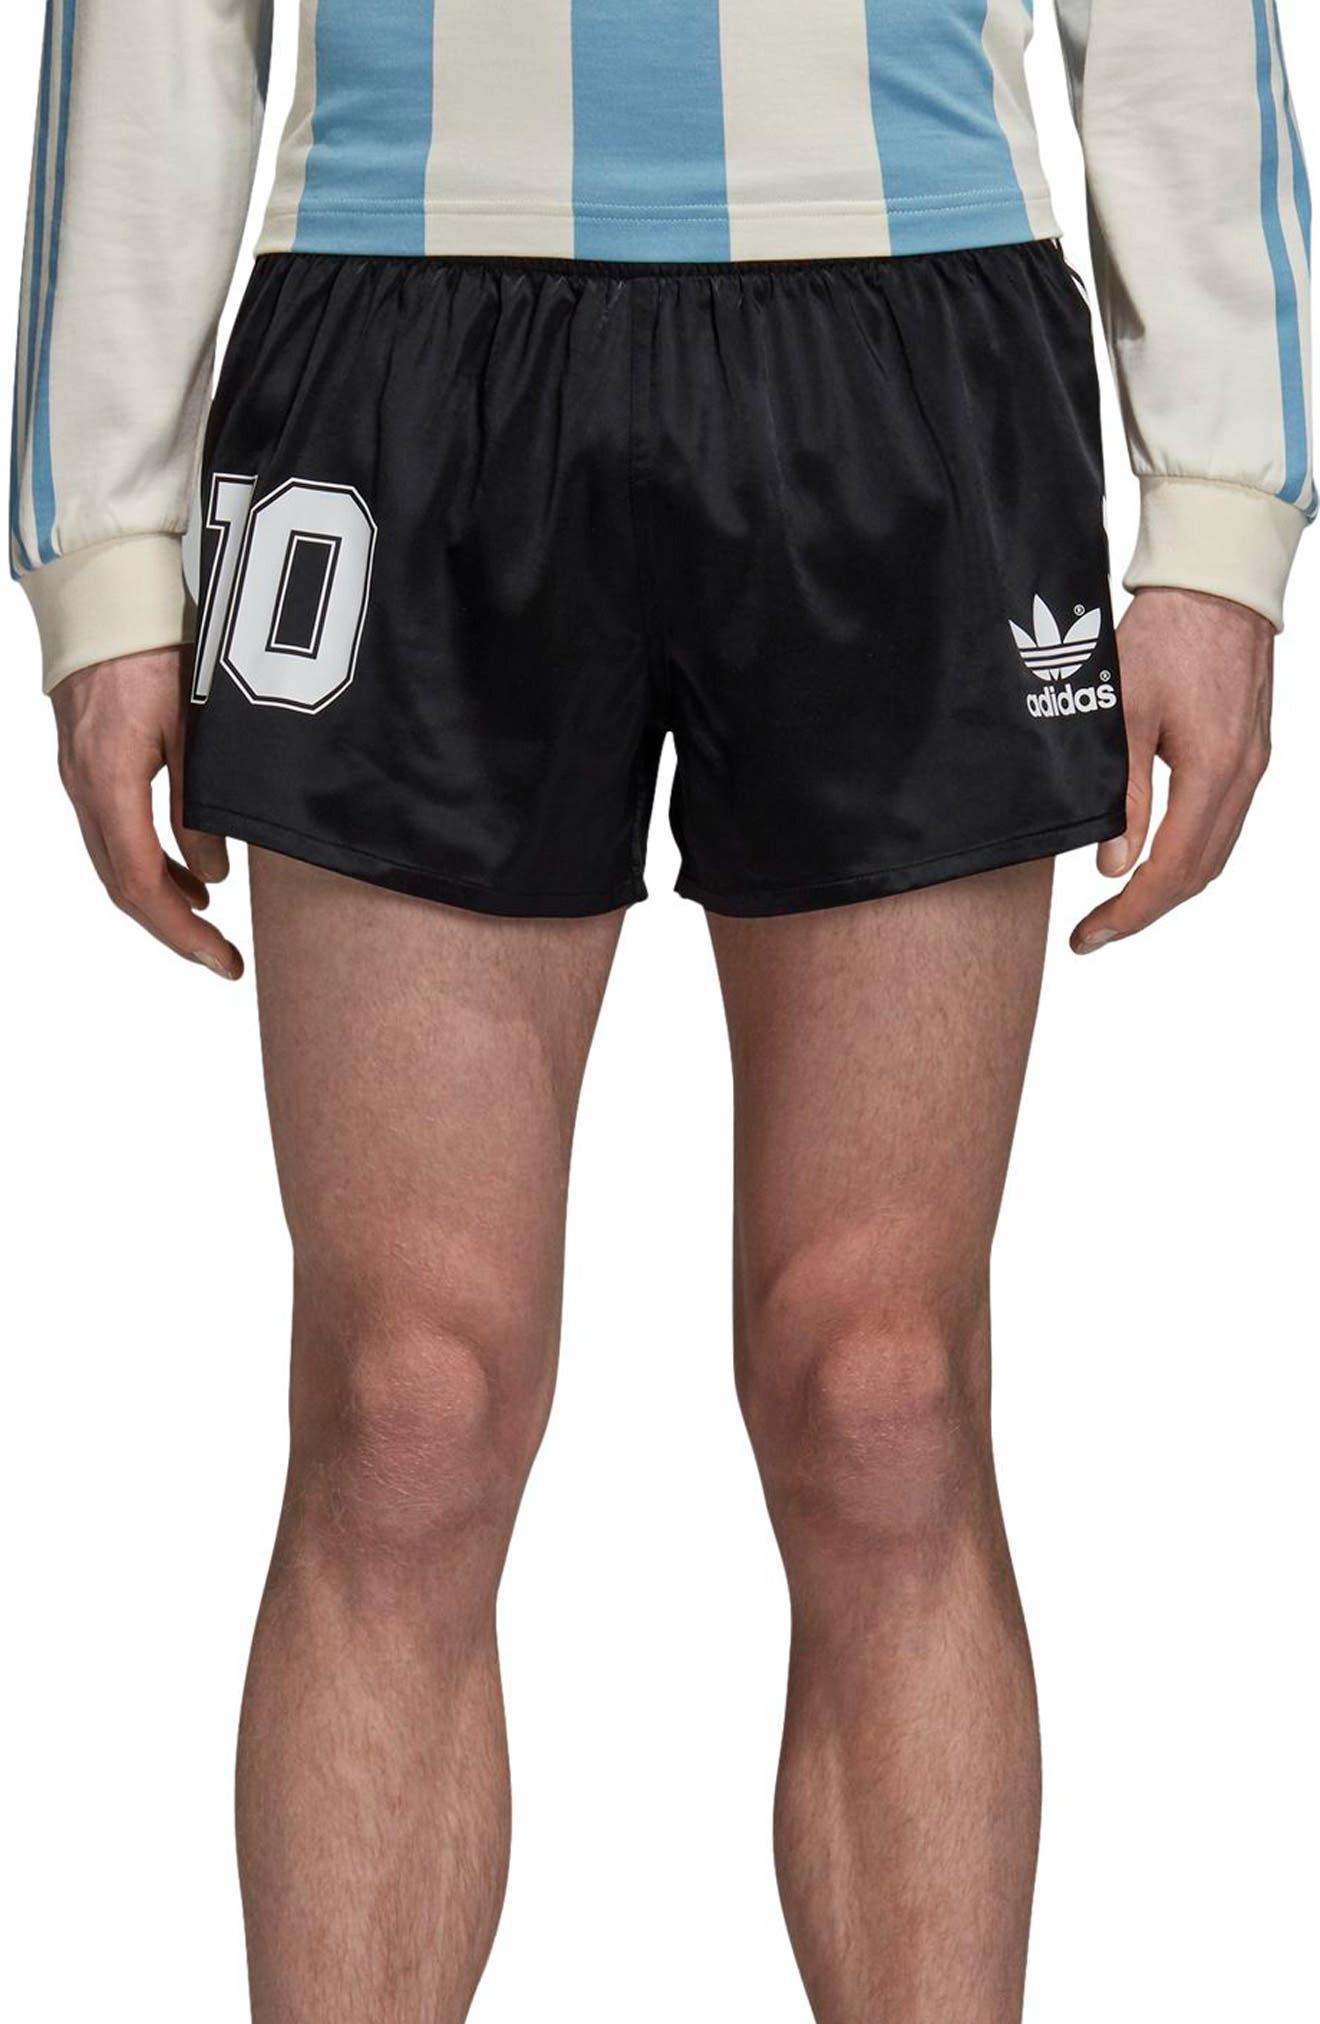 adidas Original Argentina 1987 Shorts,                         Main,                         color, Black